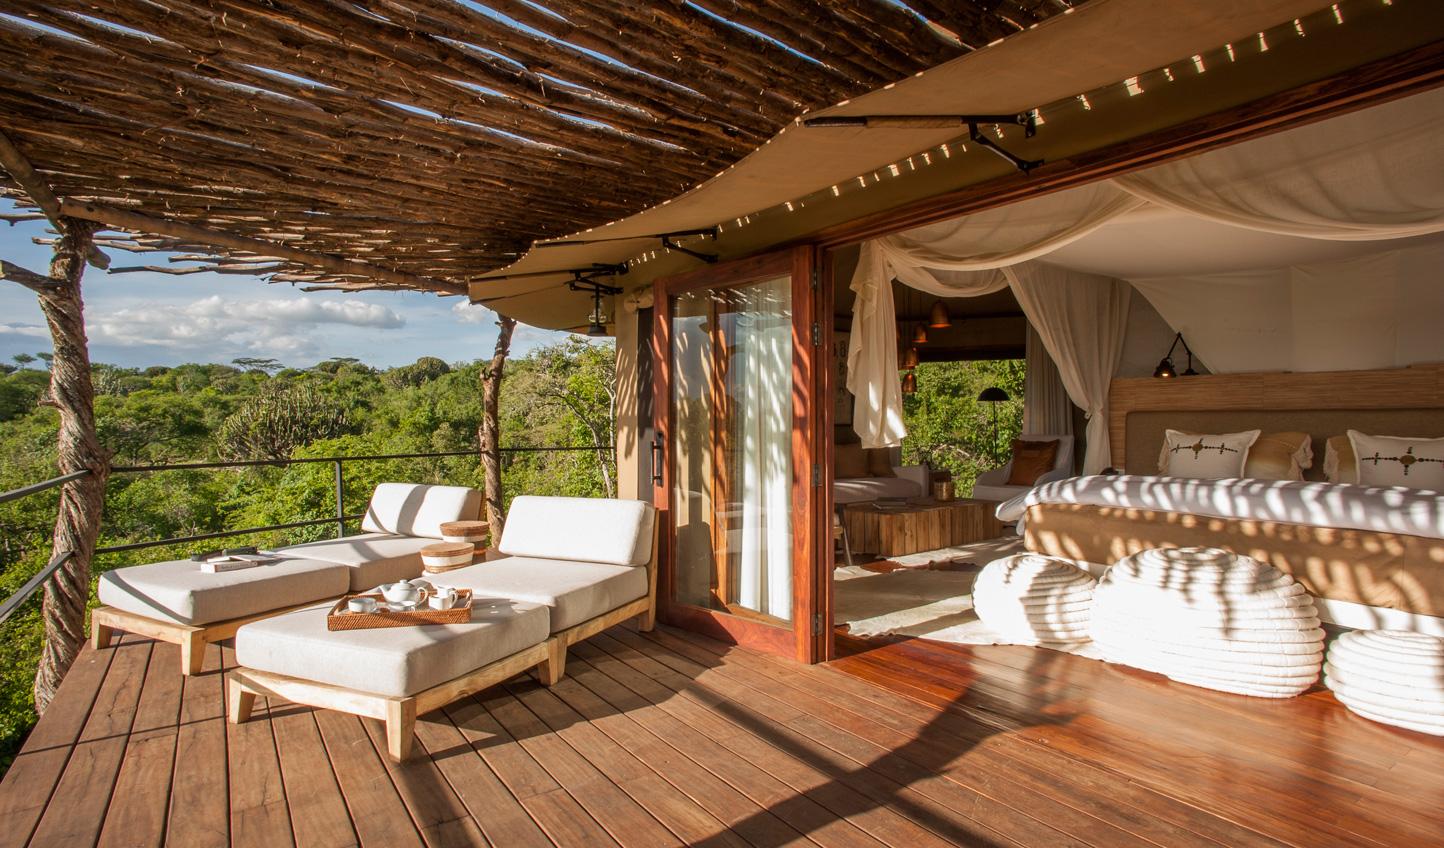 Experience unrivaled luxury at Mwiba Lodge